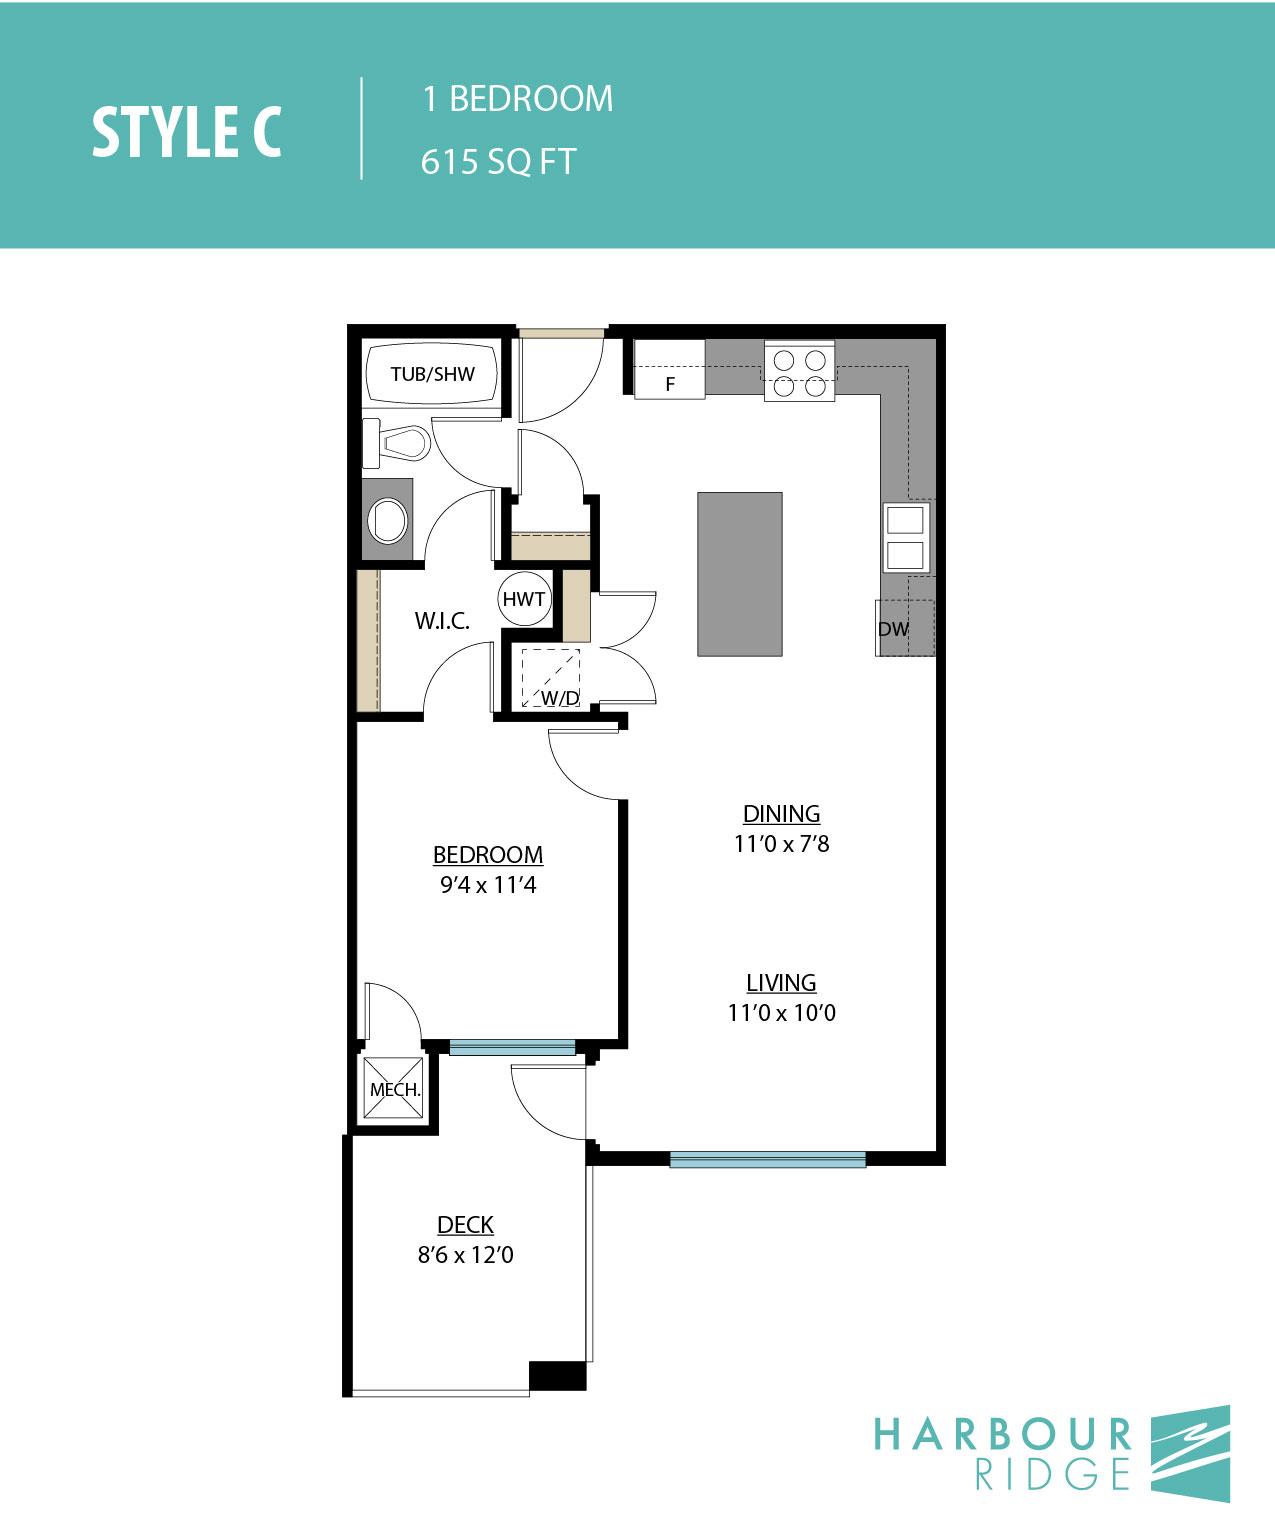 Style C | 1 Bedroom | 615 Sq. Ft.